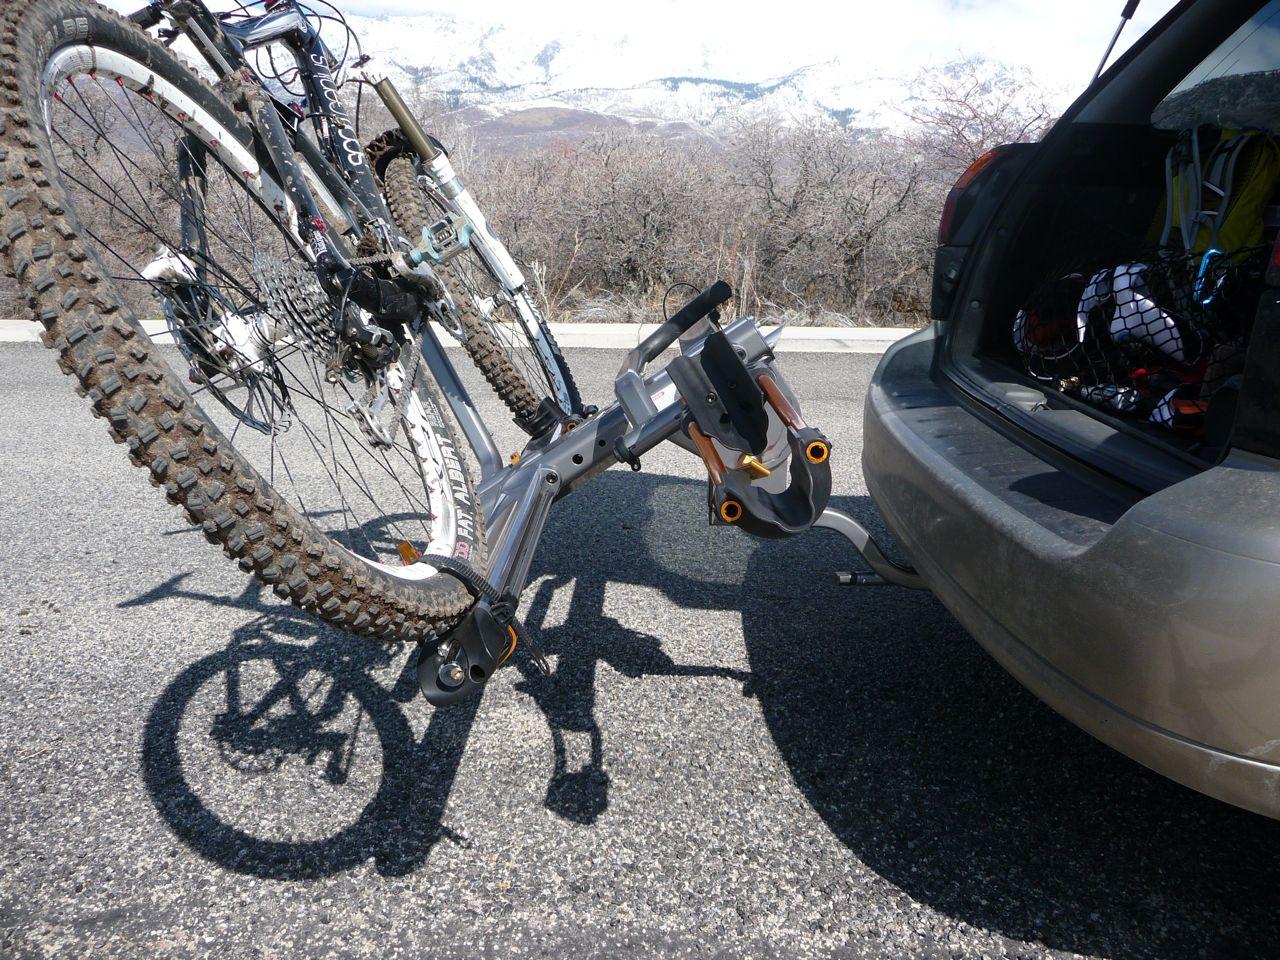 Hitch Bike Rack Reviews >> Kuat Nv Hitch Bike Rack Review Feedthehabit Com